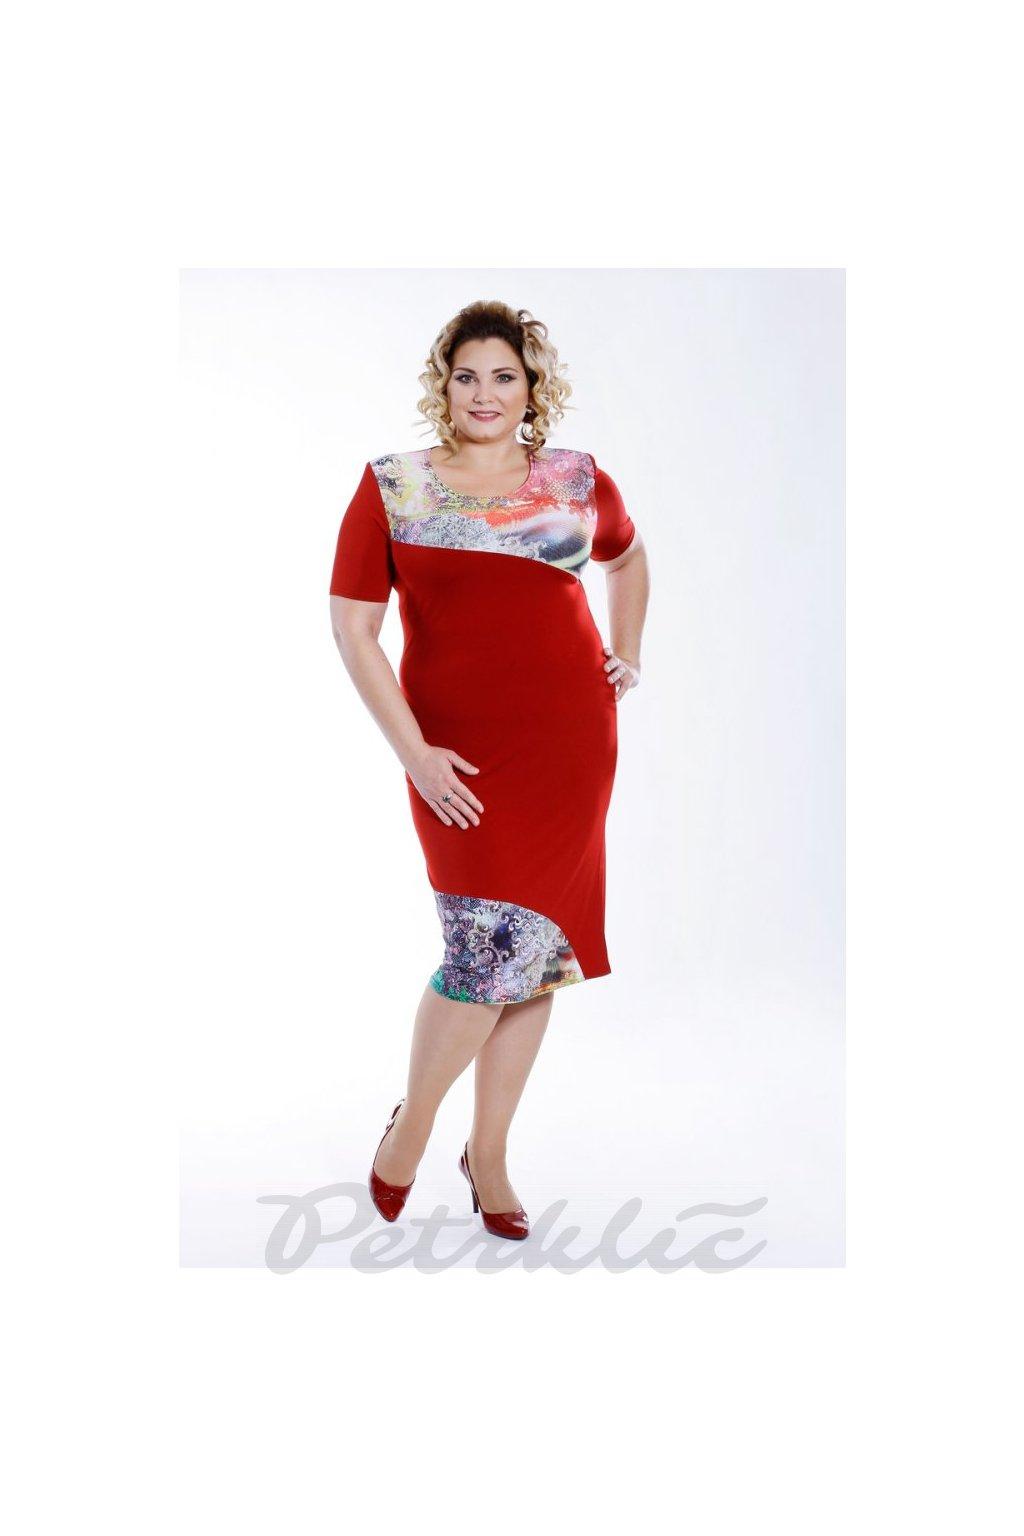 Šaty rovného střihu 120 cm